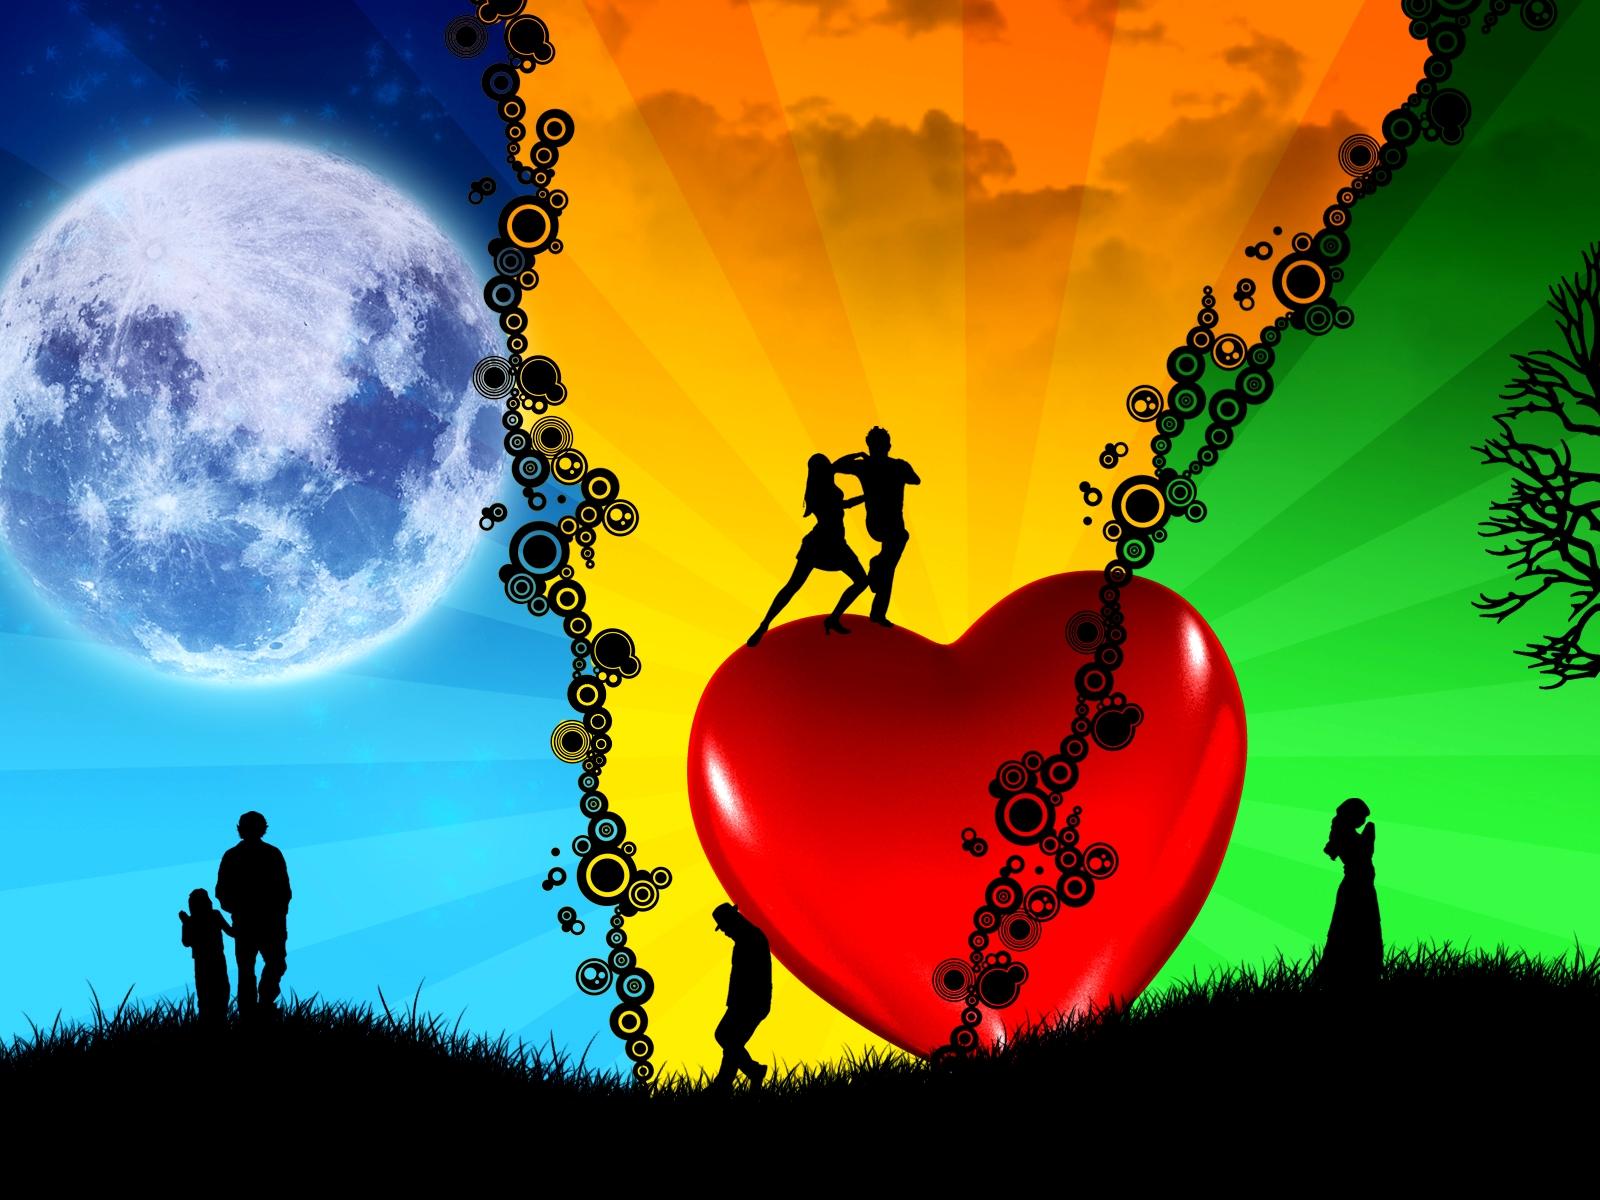 Hd wallpapers 3d love photos - Love wallpaper download 3d ...